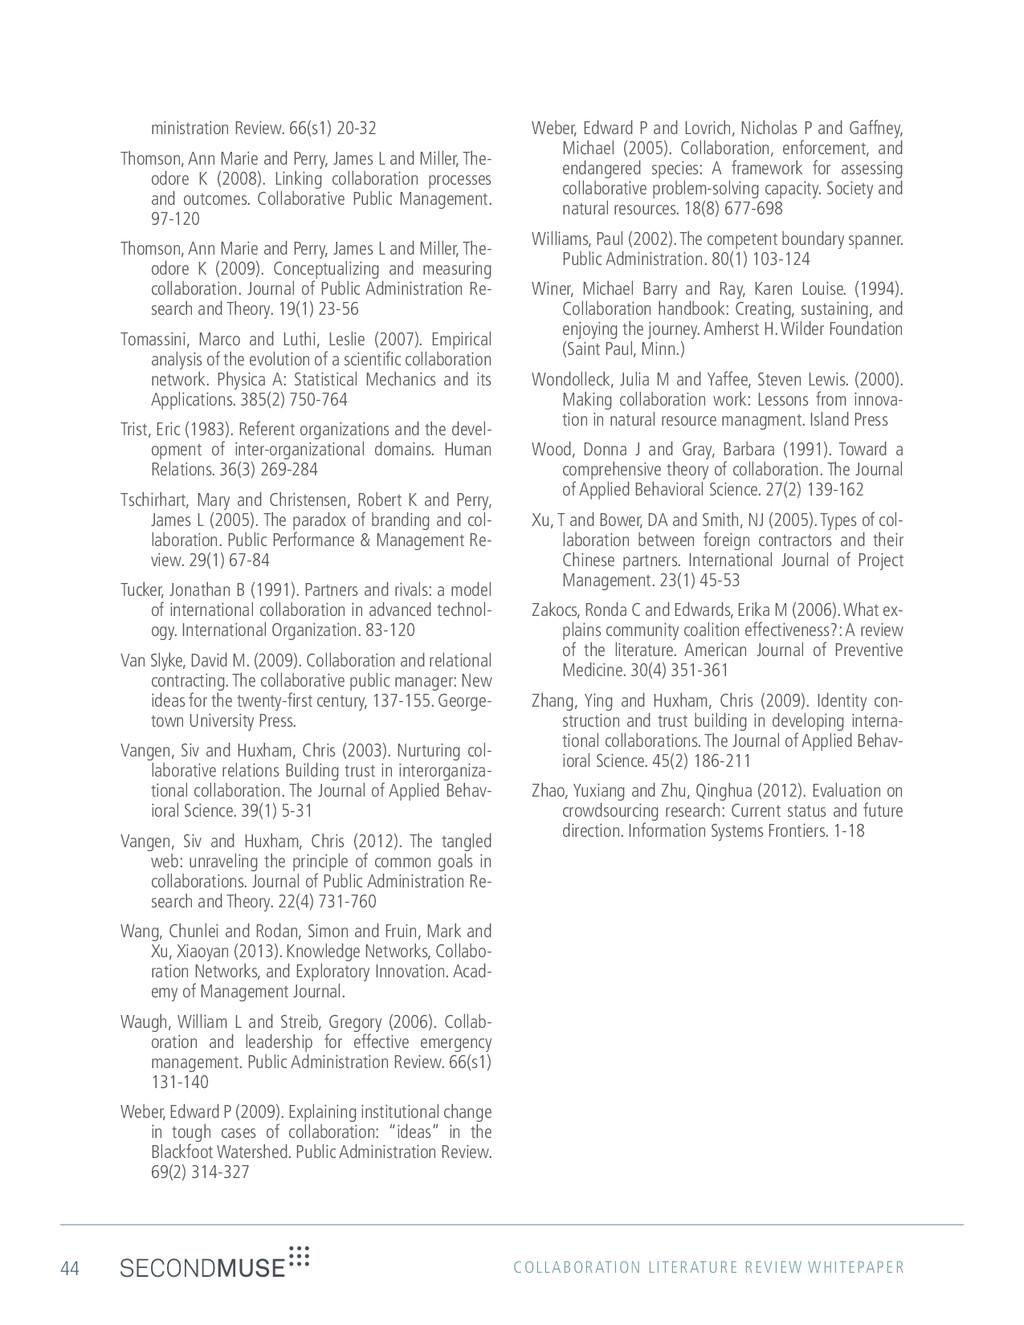 44 COLLABORATION LITERATURE REVIEW WHITEPAPER m...